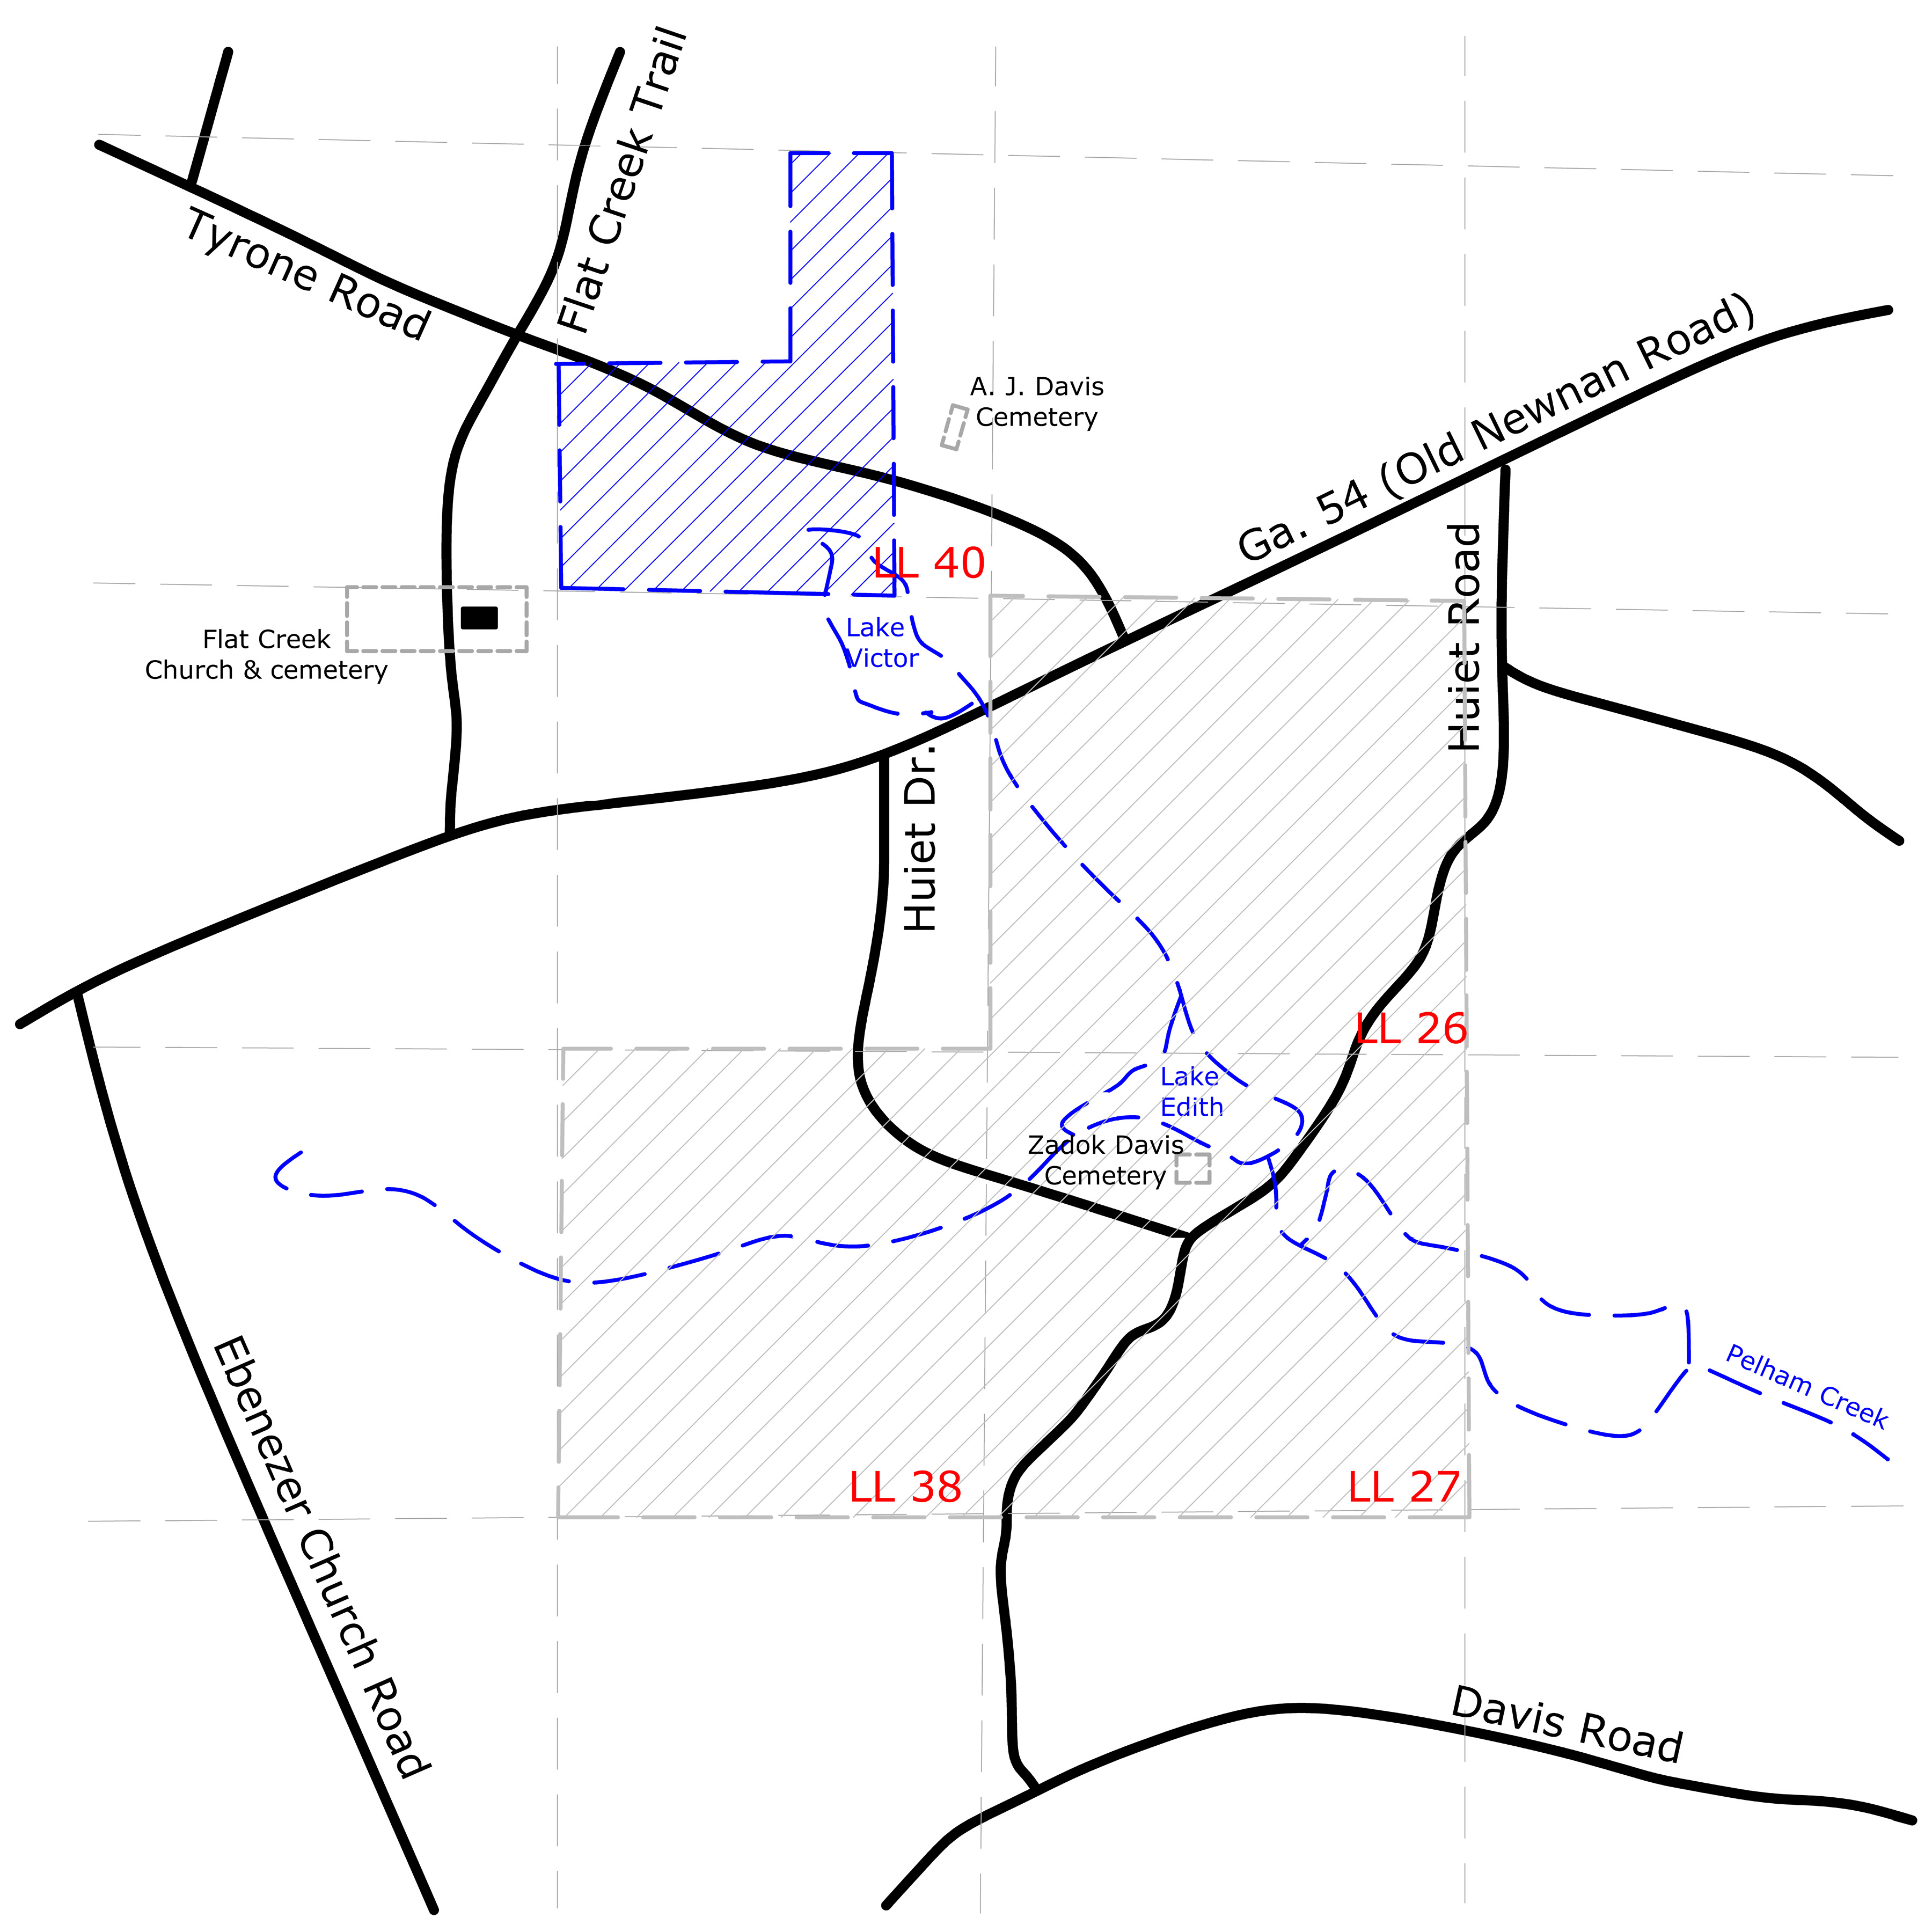 DavisWesley - Map of georgia fayetteville